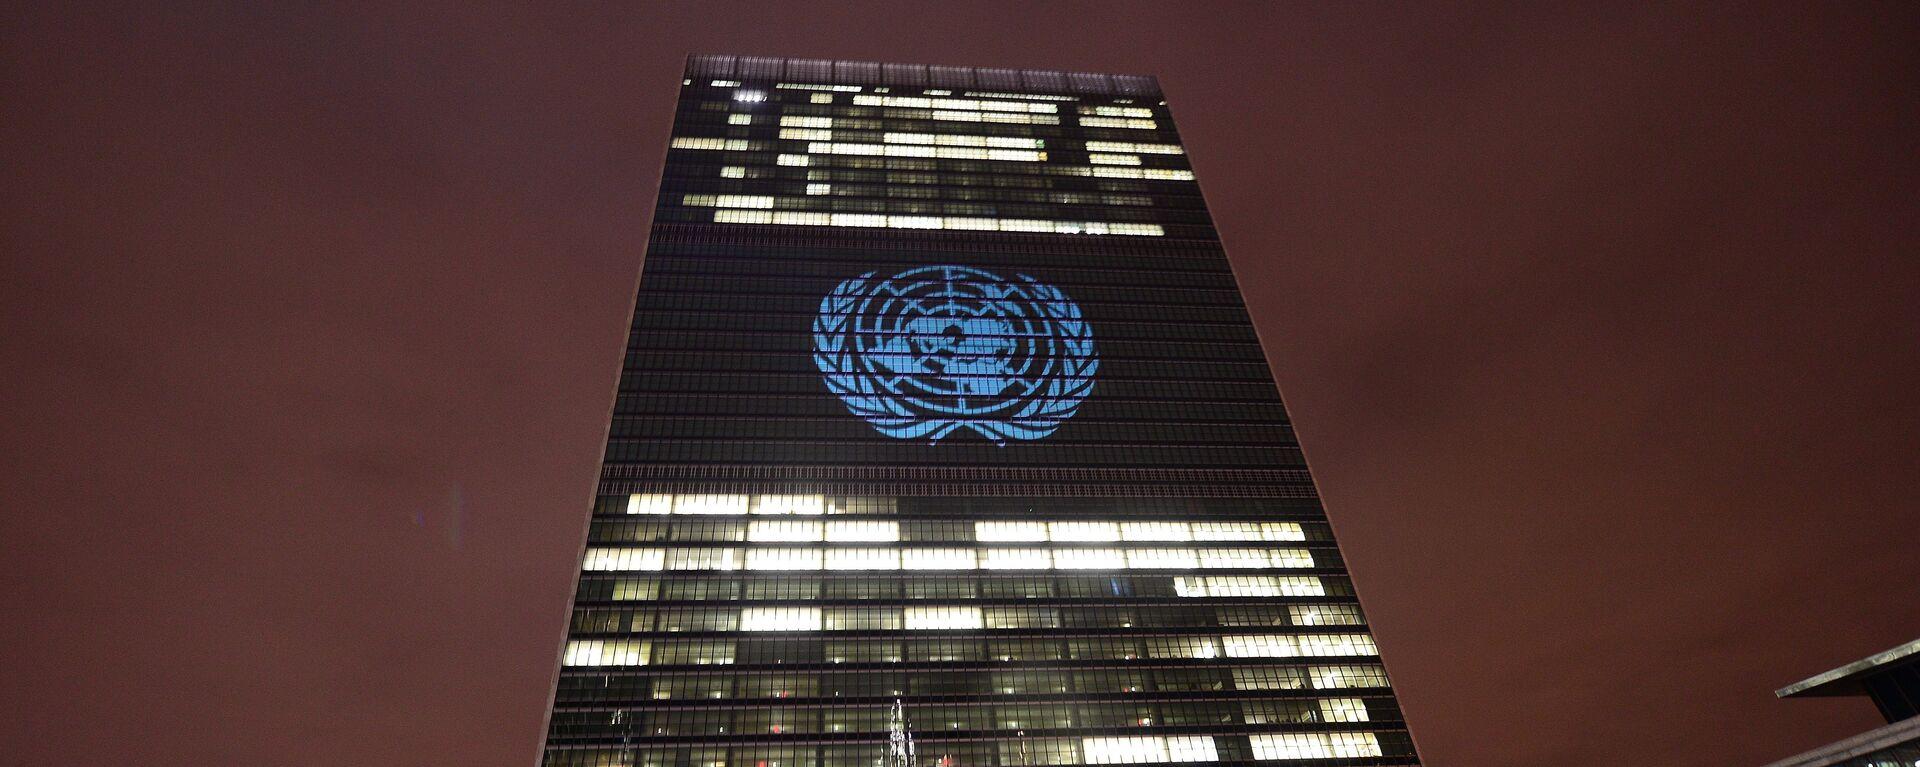 Sede de la ONU en Nueva York - Sputnik Mundo, 1920, 08.09.2020